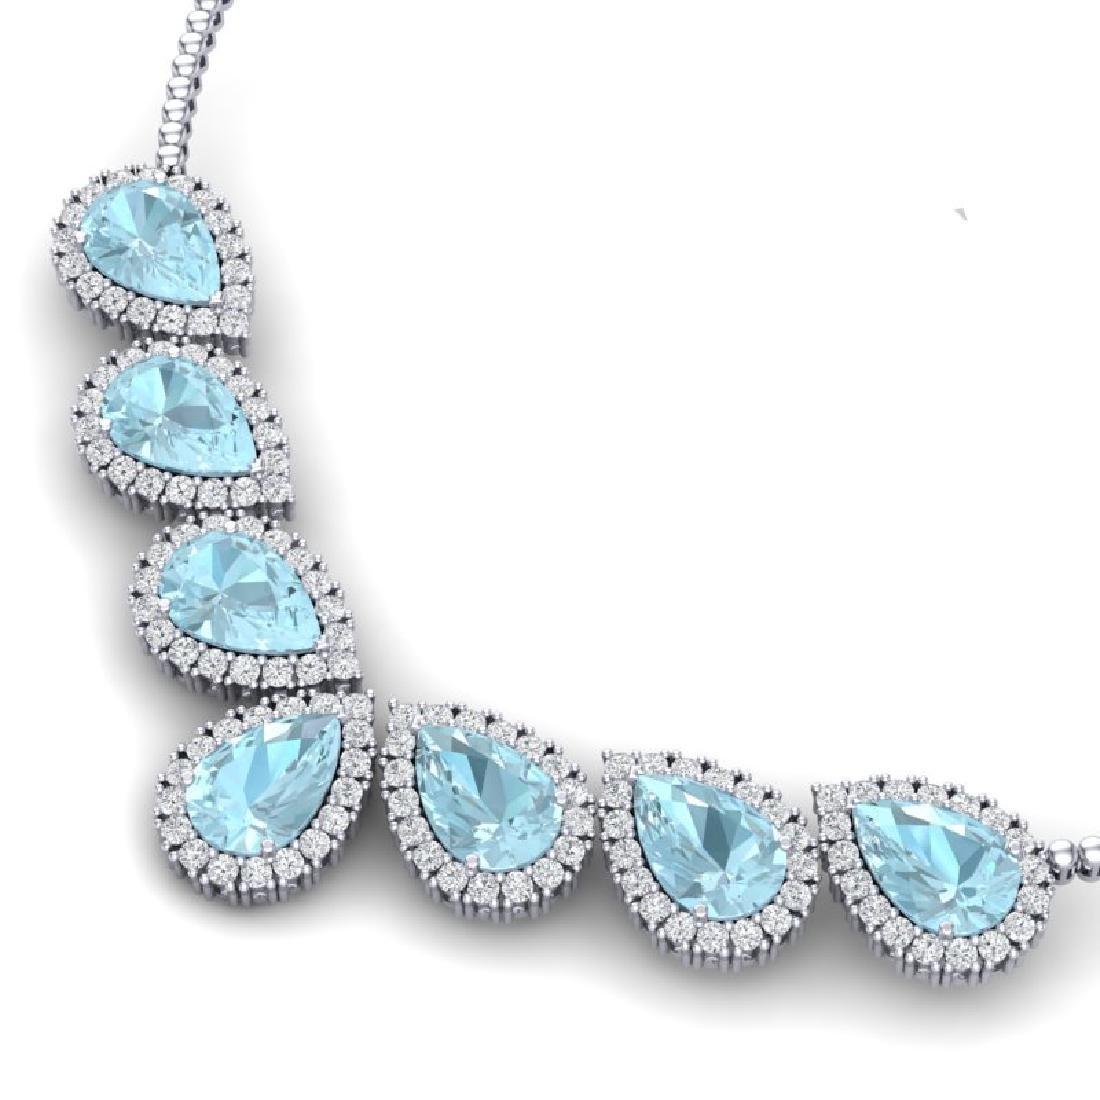 36.24 CTW Royalty Sky Topaz & VS Diamond Necklace 18K - 2